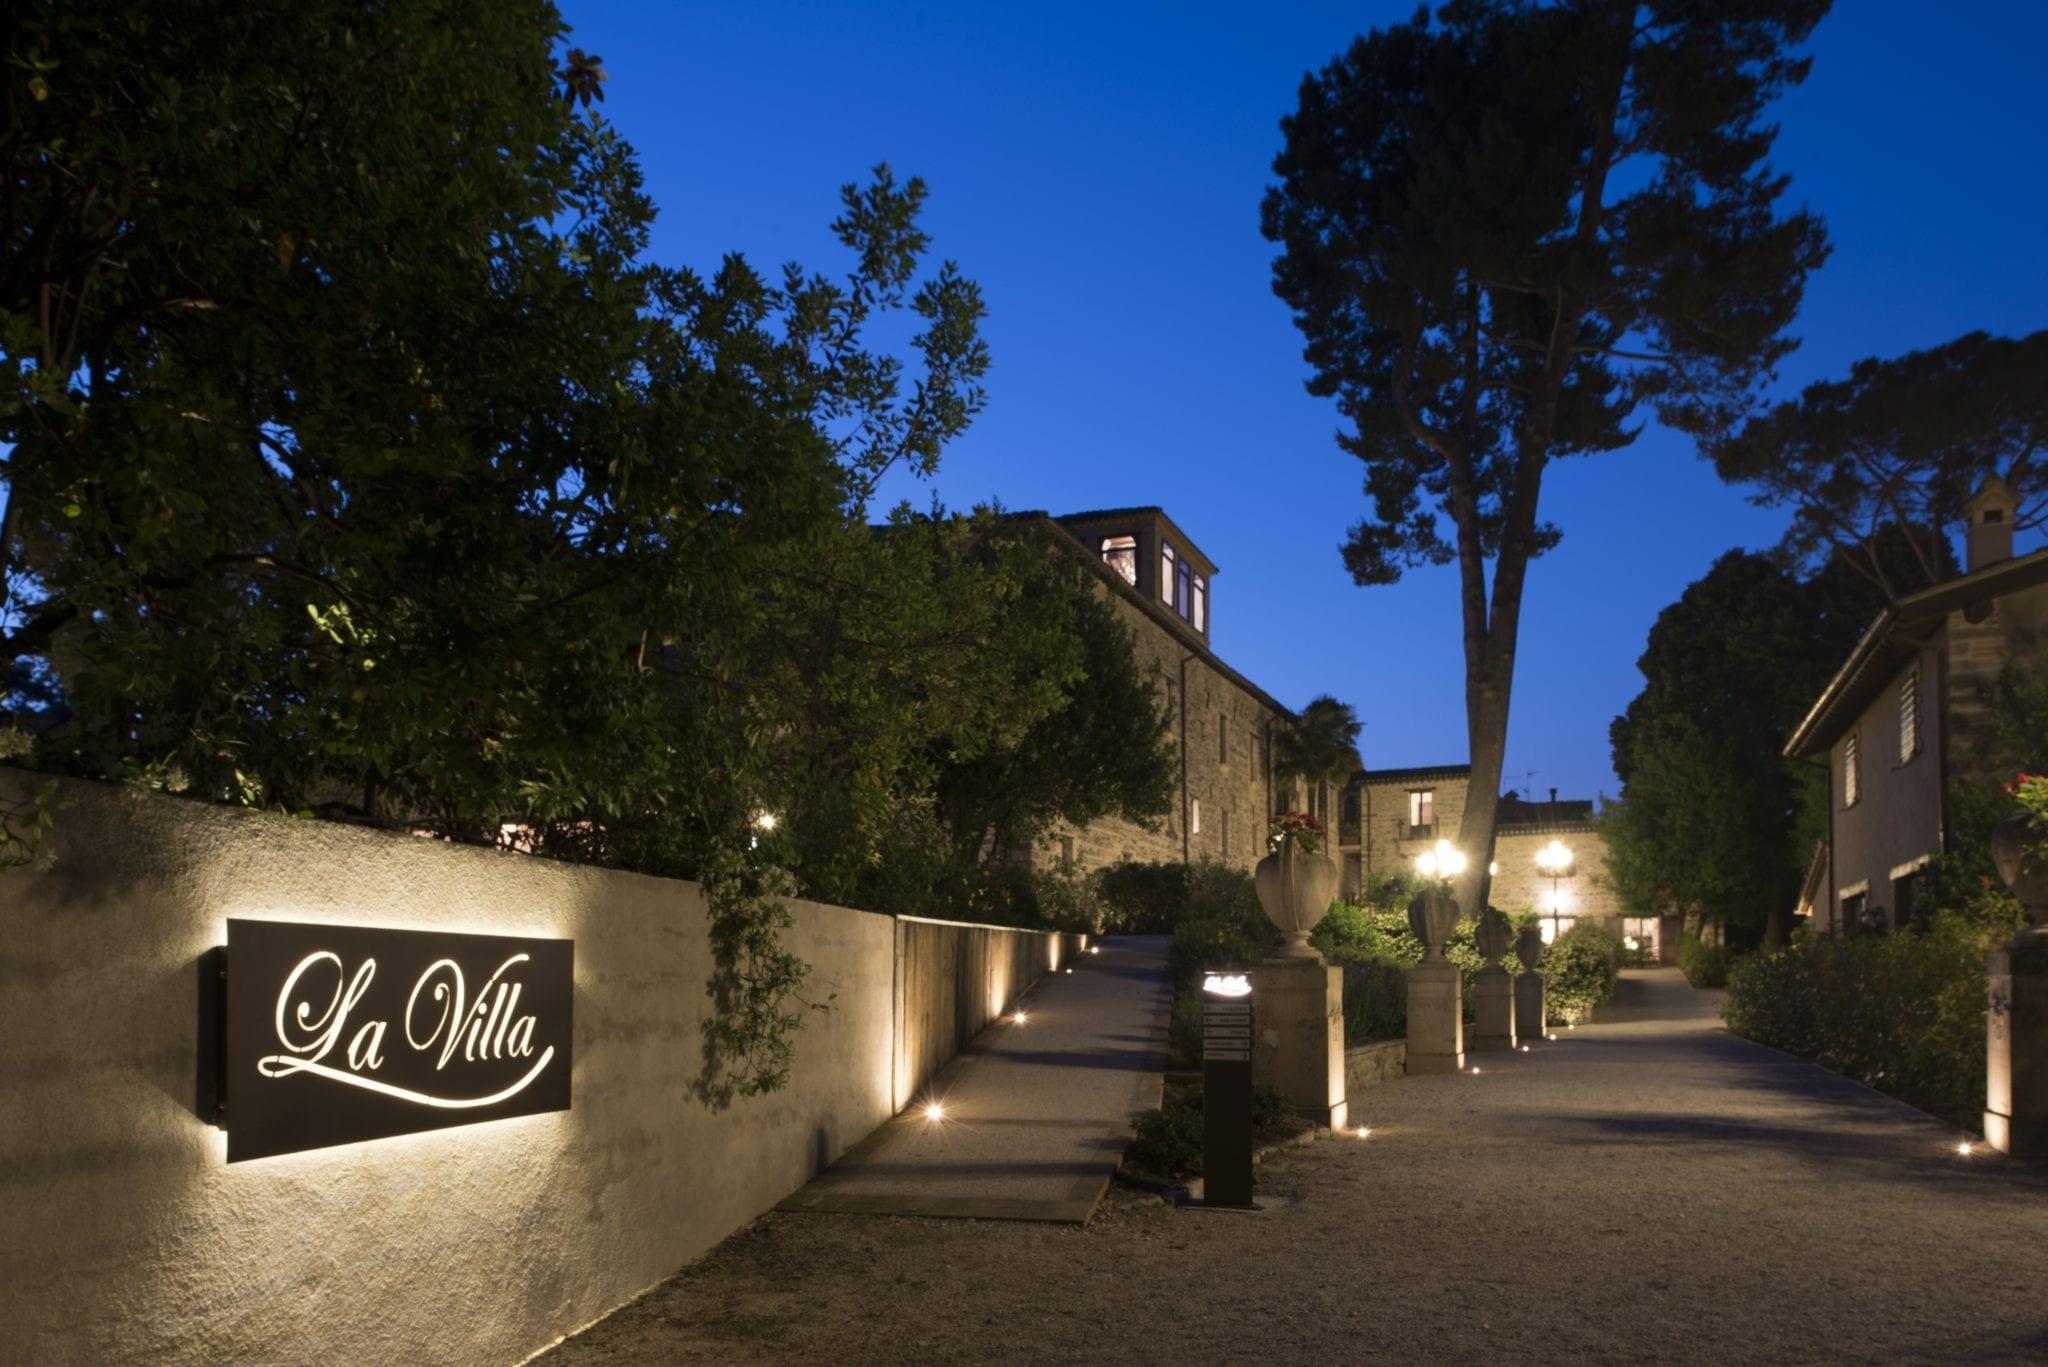 Villa Teloni - Location per matrimoni